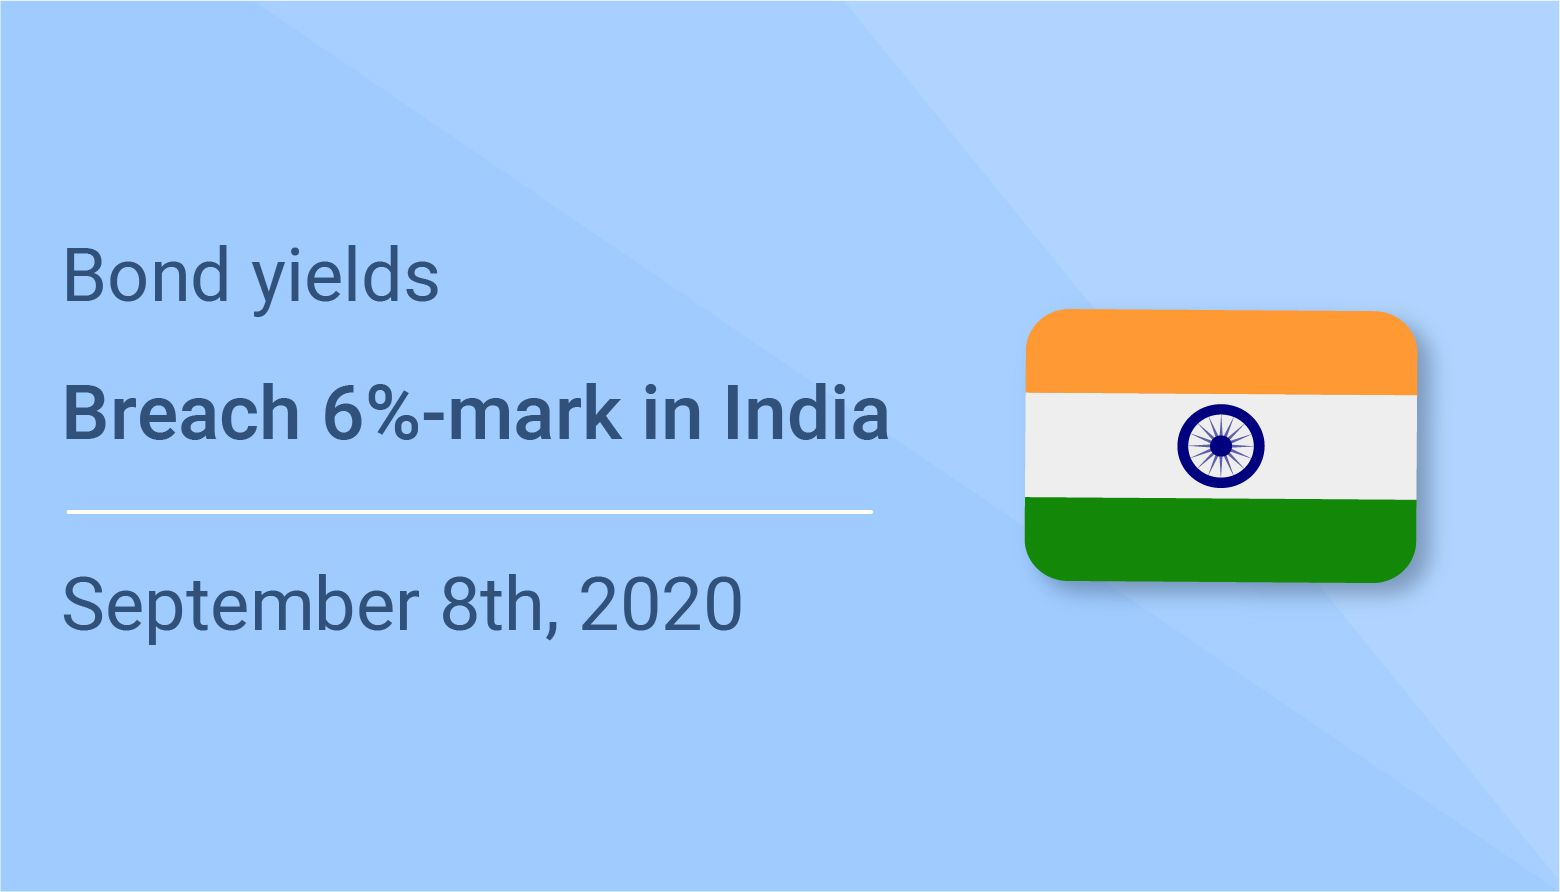 Bond yields breach 6%-mark in India